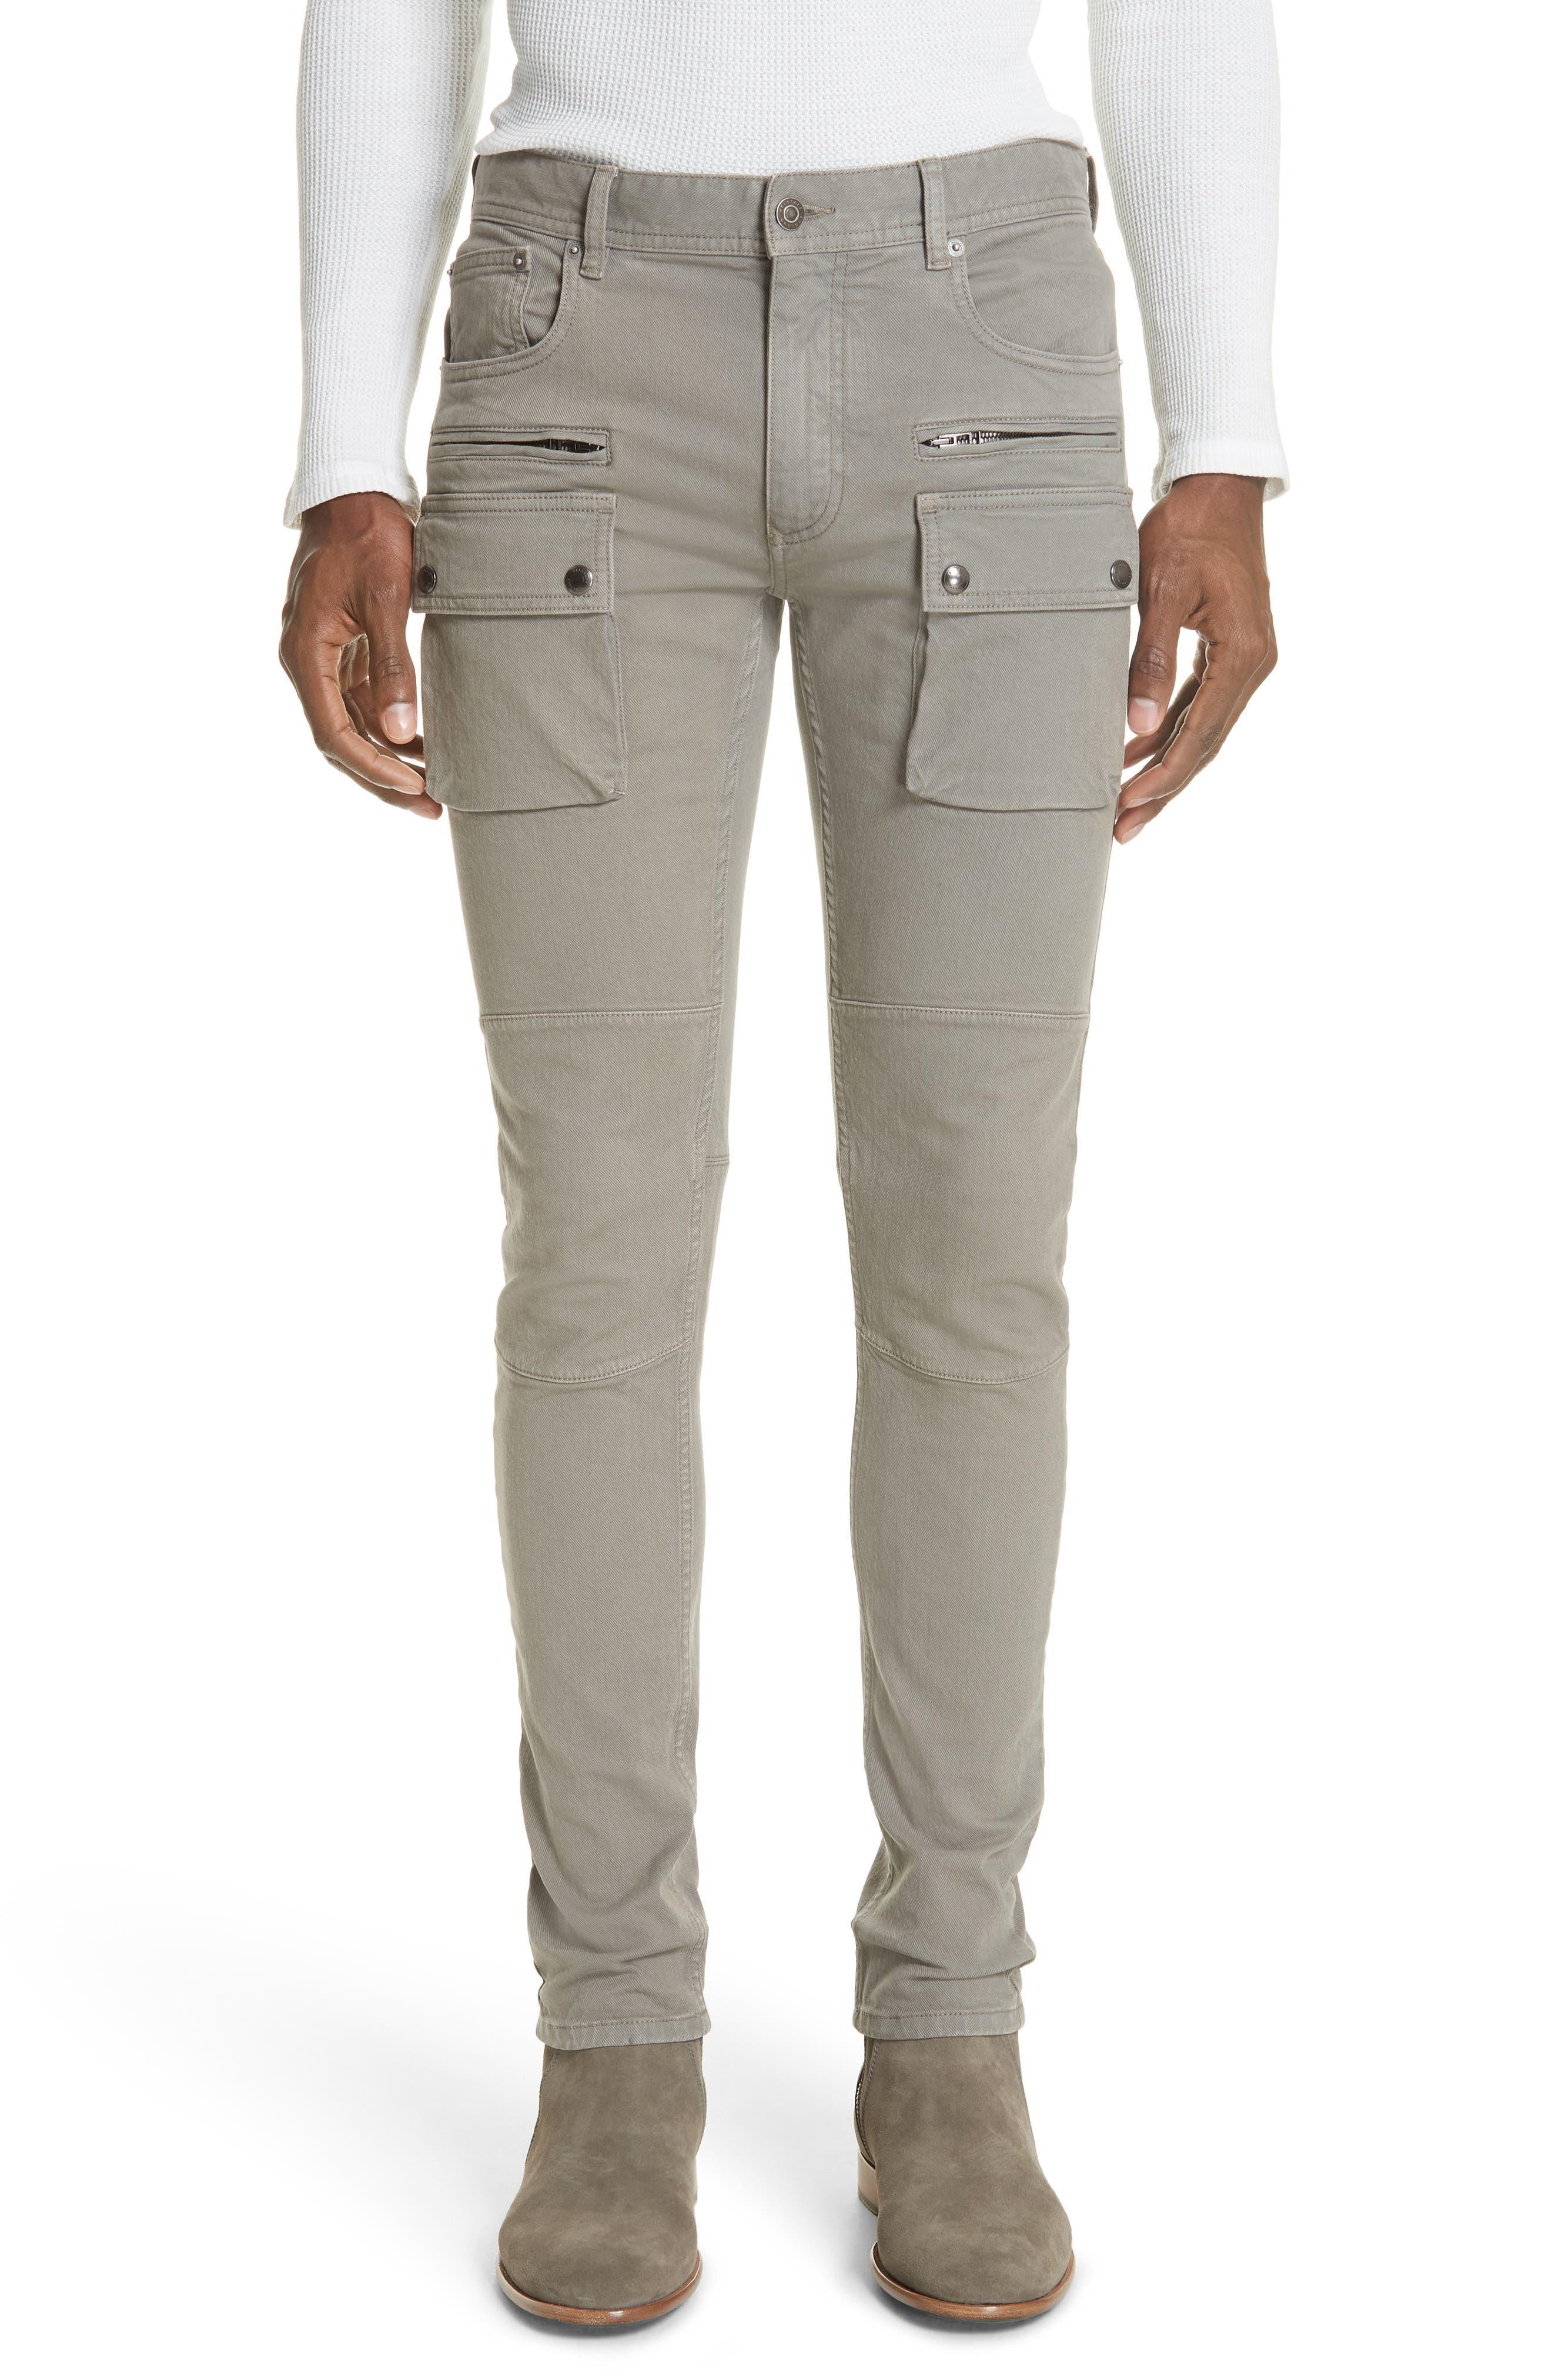 Polmont Cargo Denim Jeans,                             Main thumbnail 1, color,                             SMOKE GREY